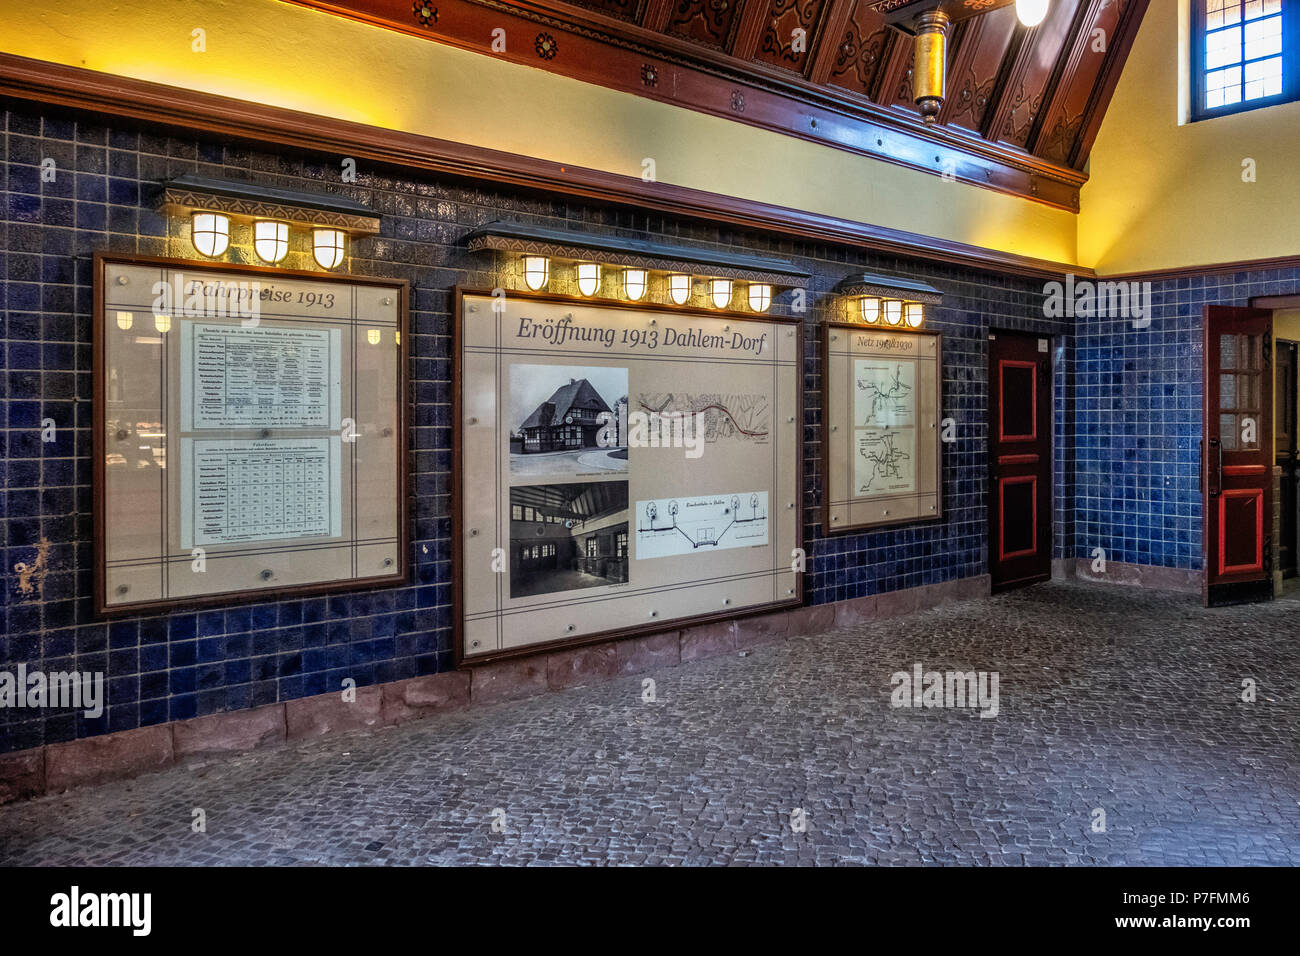 Berlin Dahlem-Dorf U-Bahn underground railway station on U 3 line. Historic building interior with blue tiles, wood panel ceiling, Information boards - Stock Image